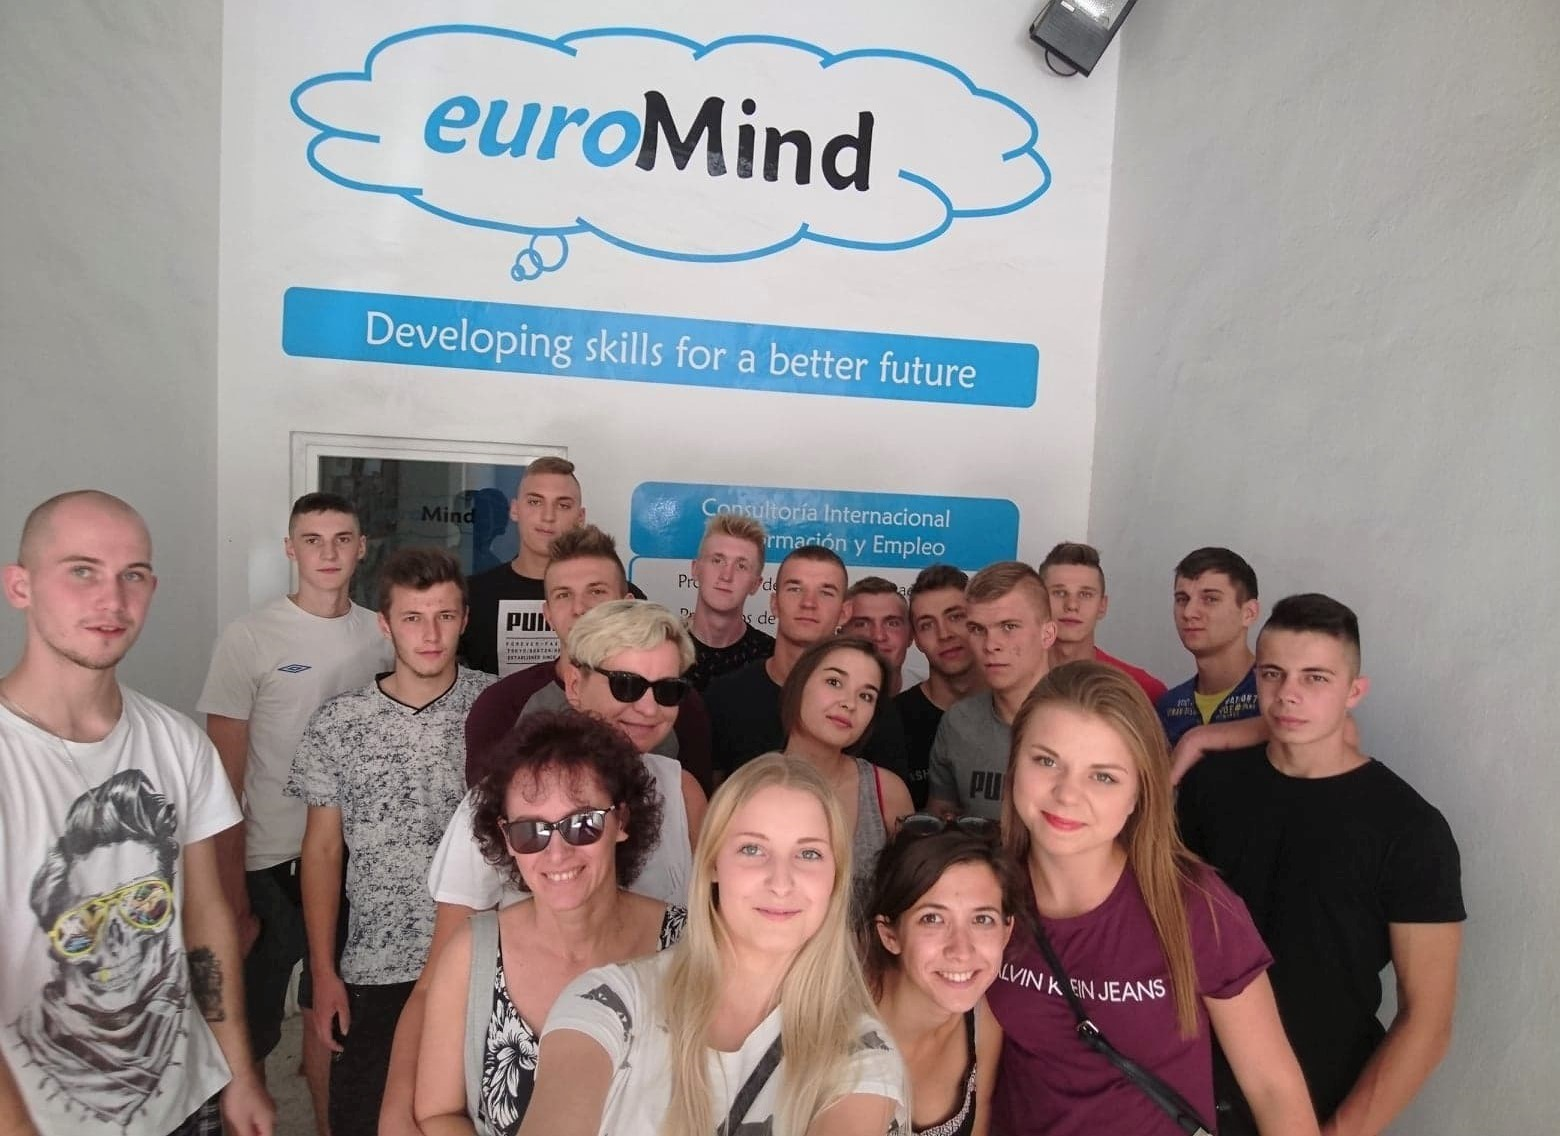 euromind foto